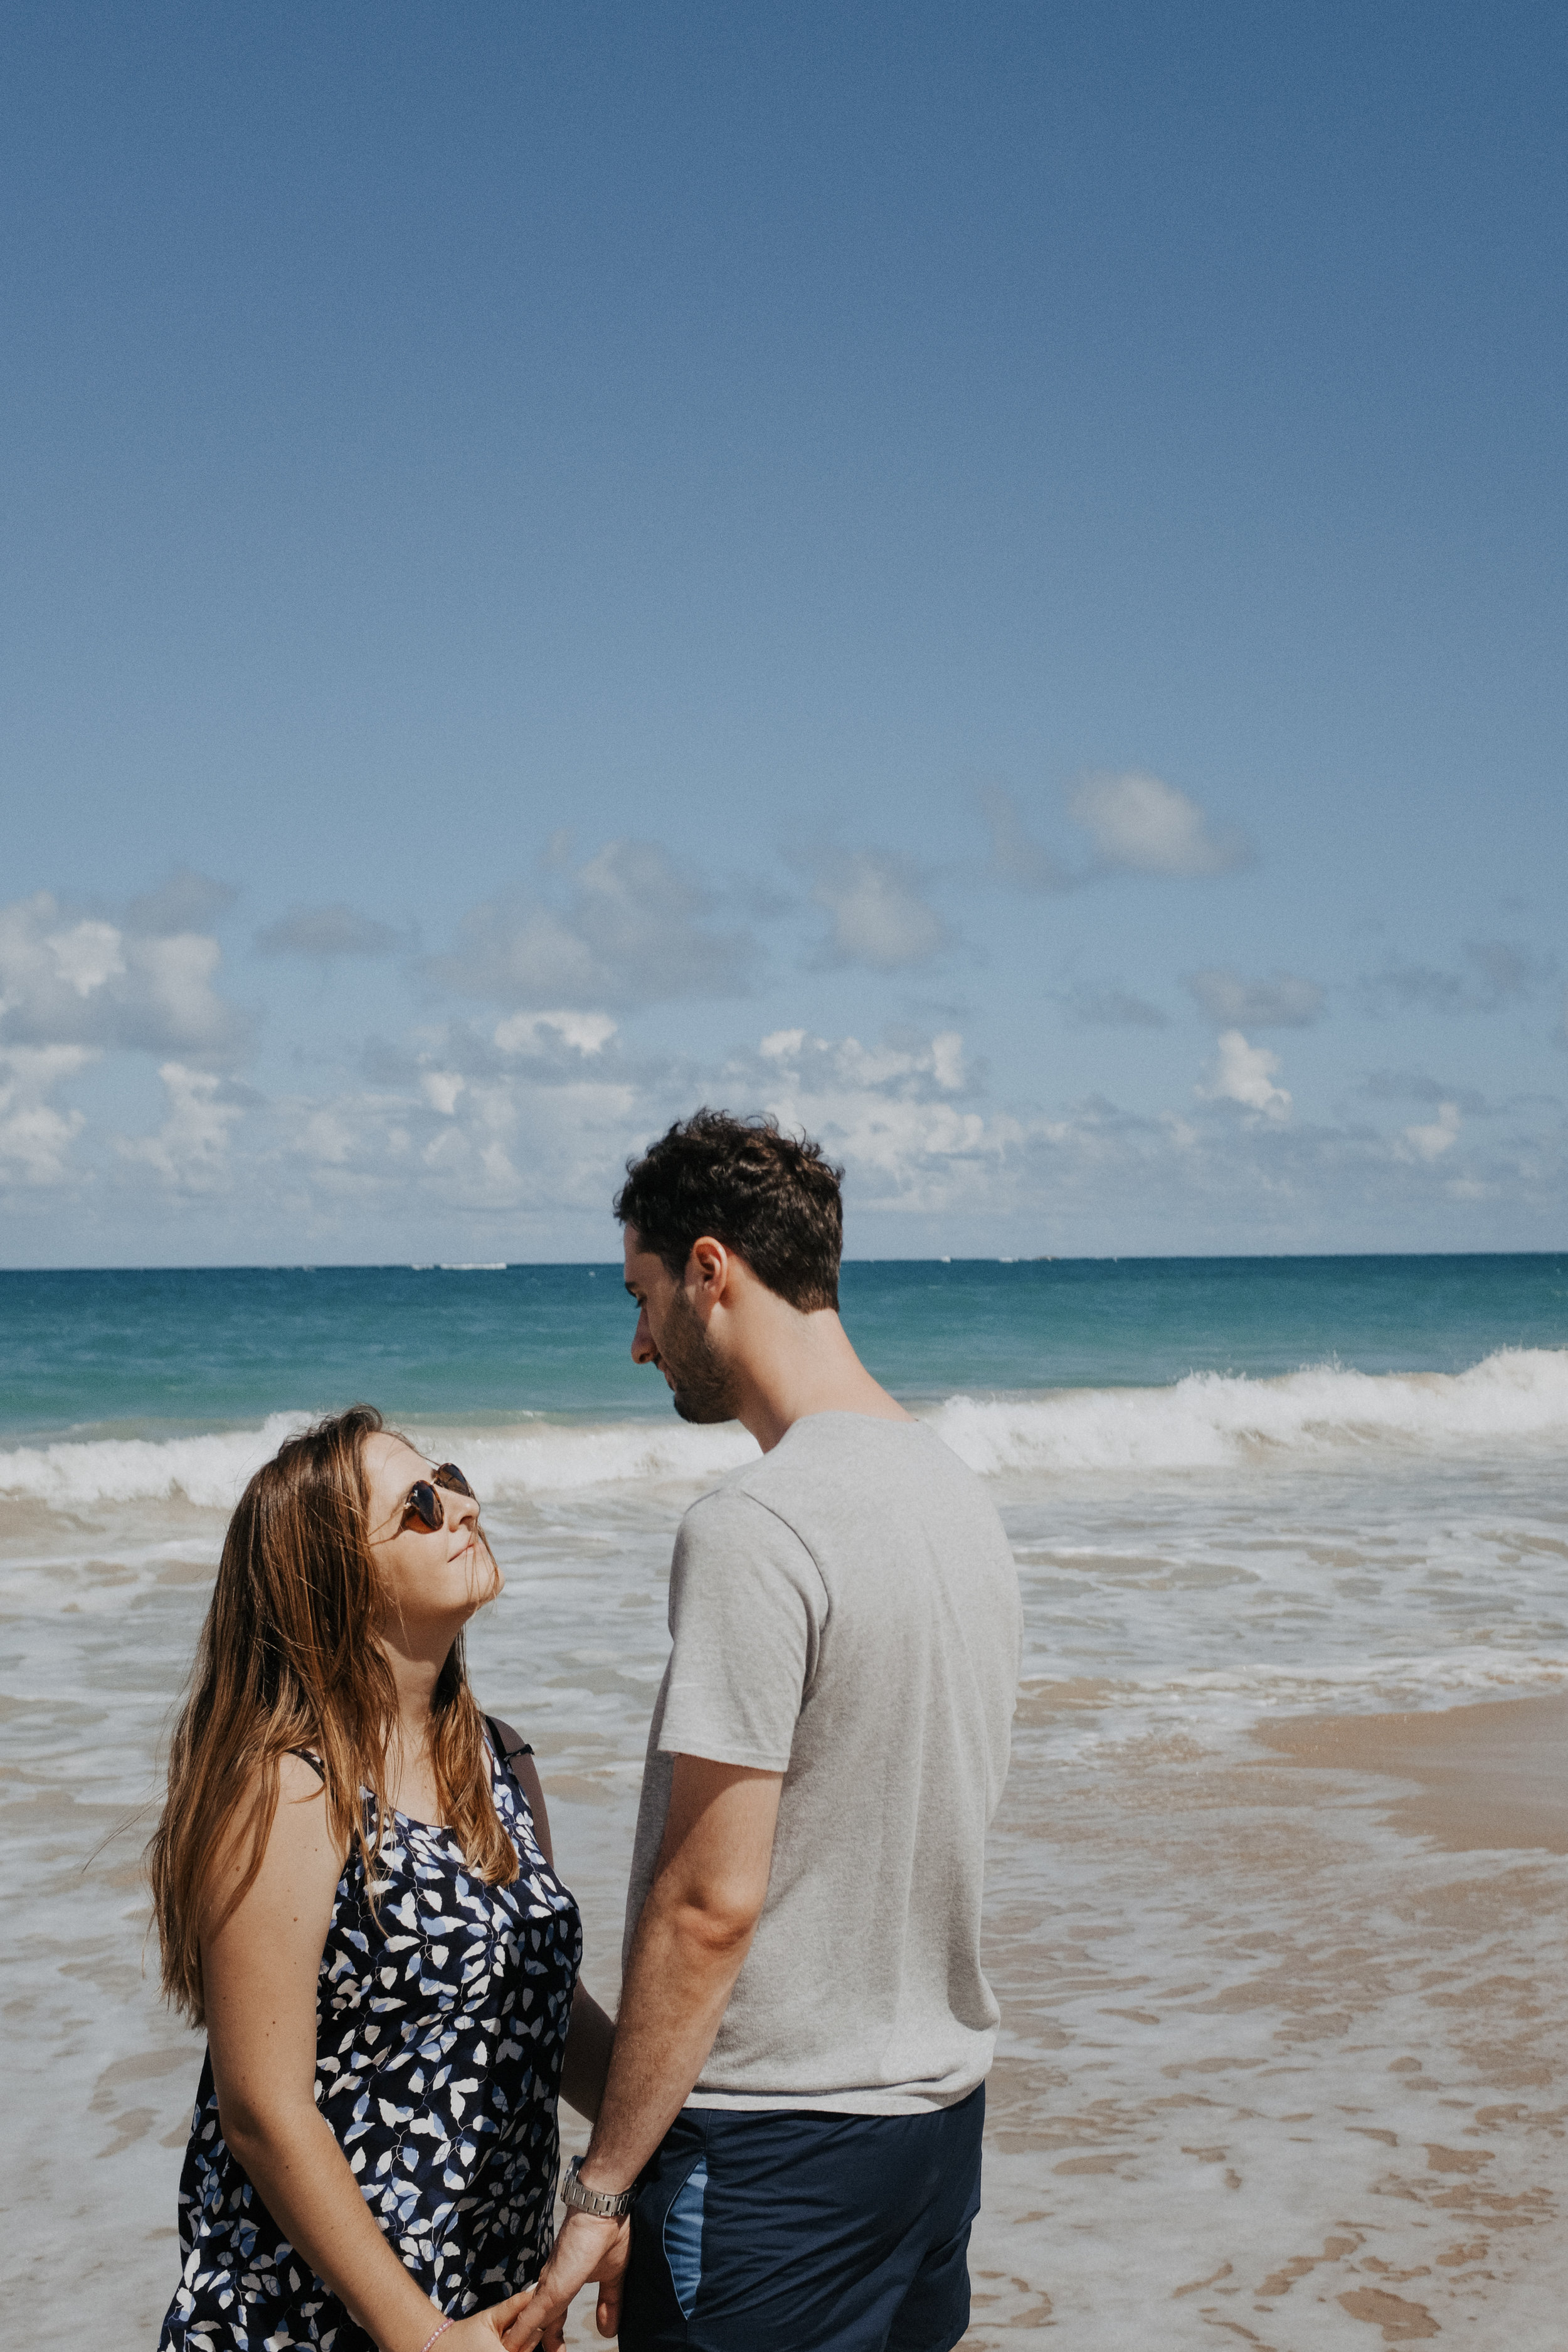 Jony&Nati_PuertoRico_Feb2019_(c)FeliciaLimPhotography_3.jpg